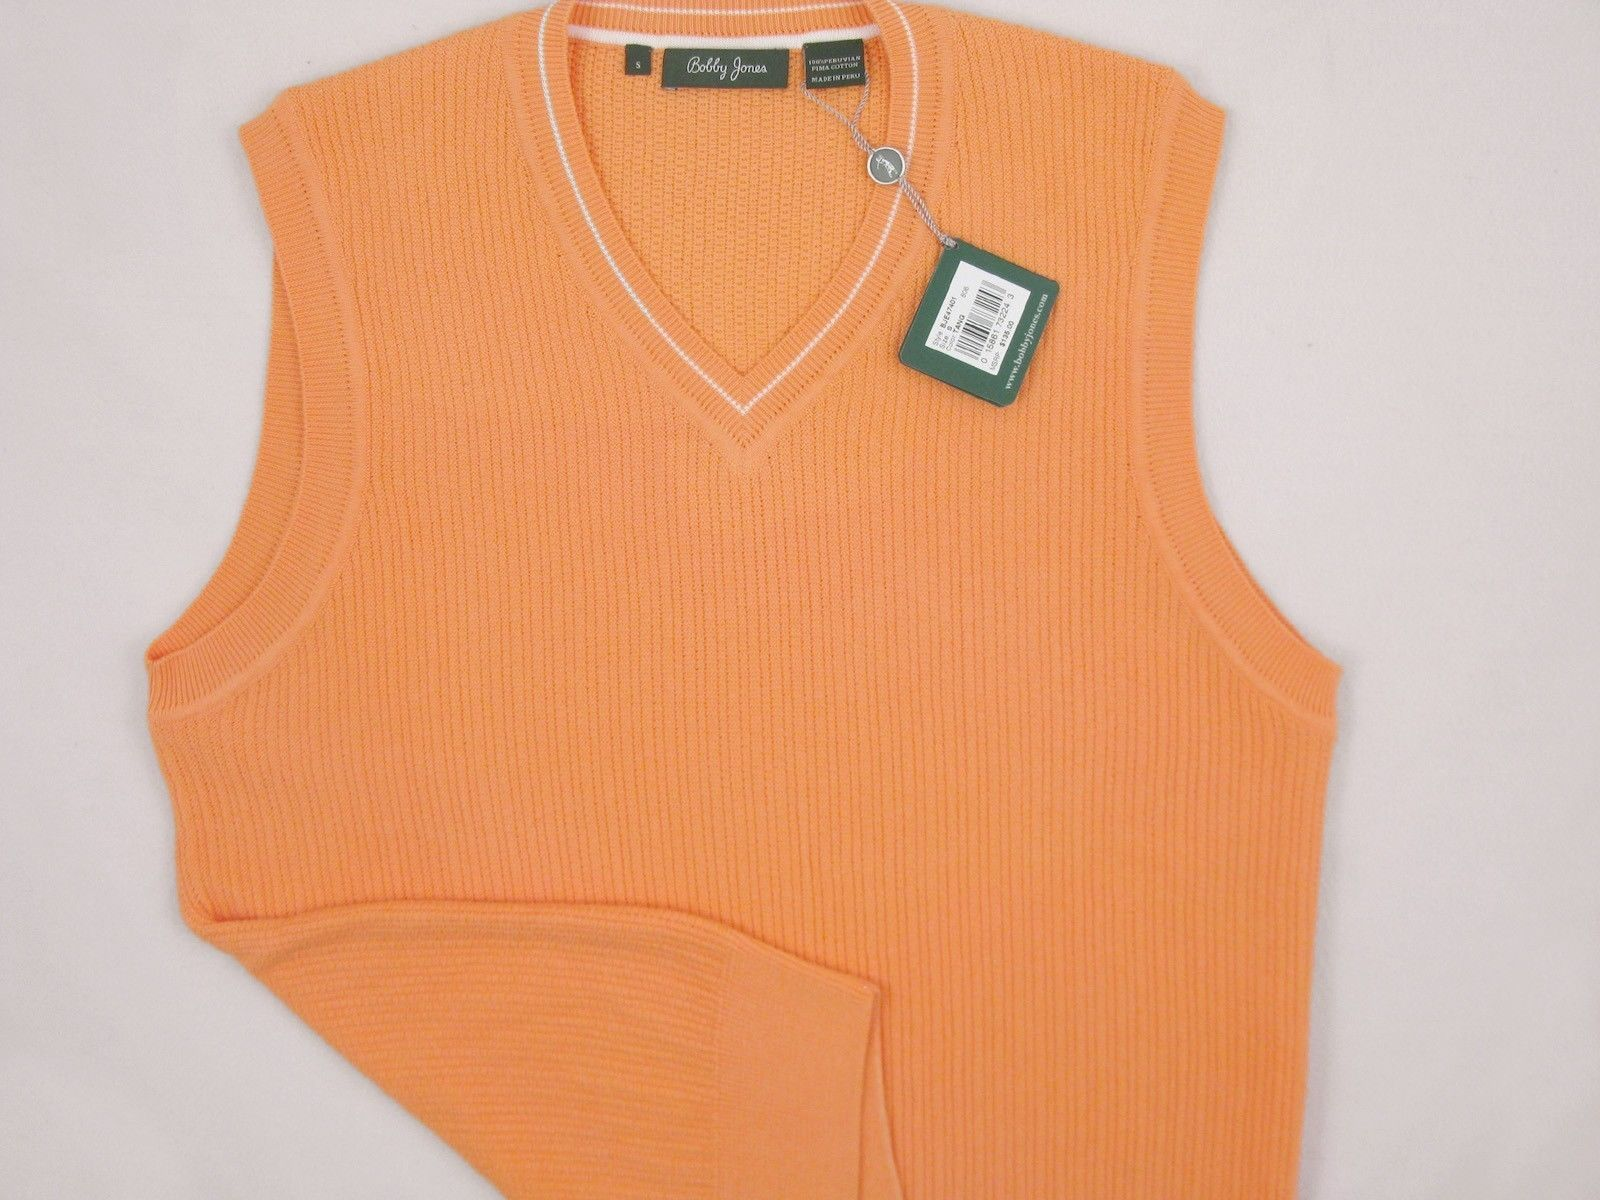 NEW! NWT! $135 Bobby Jones Collection Colorful Vest! 100% Peruvian Pima Cotton image 5